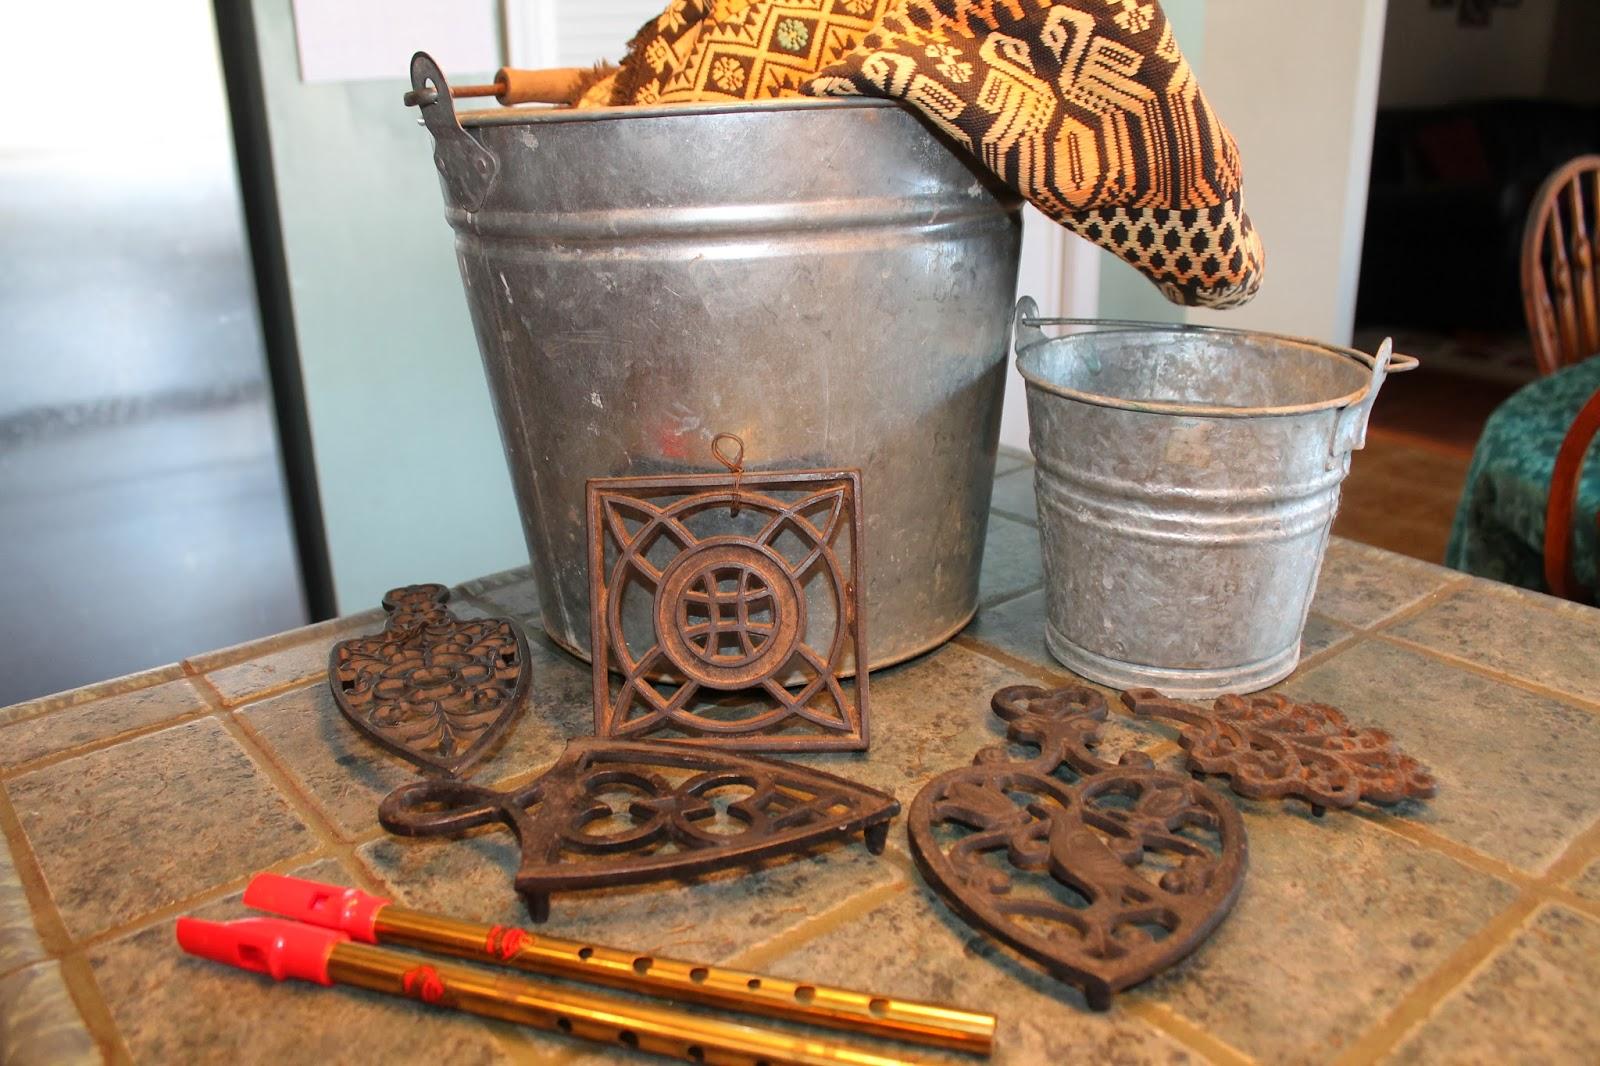 cast iron trivets, galvanized bucket, penny whistle